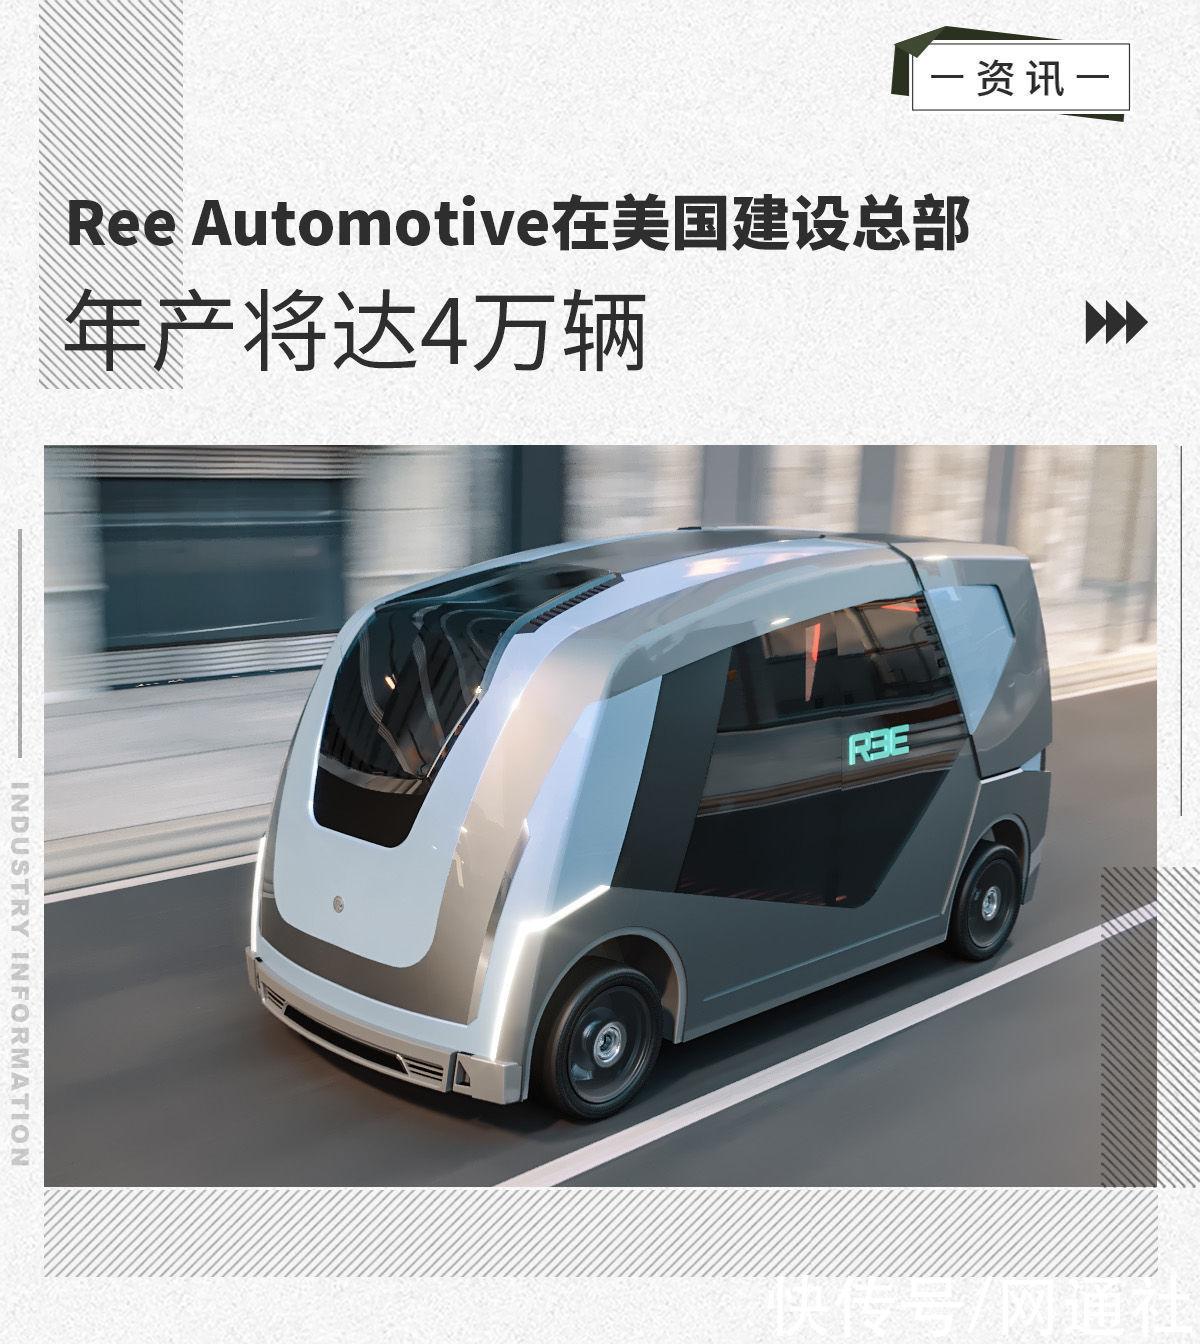 Ree Automotive在美國建設總部 年產將達4萬輛